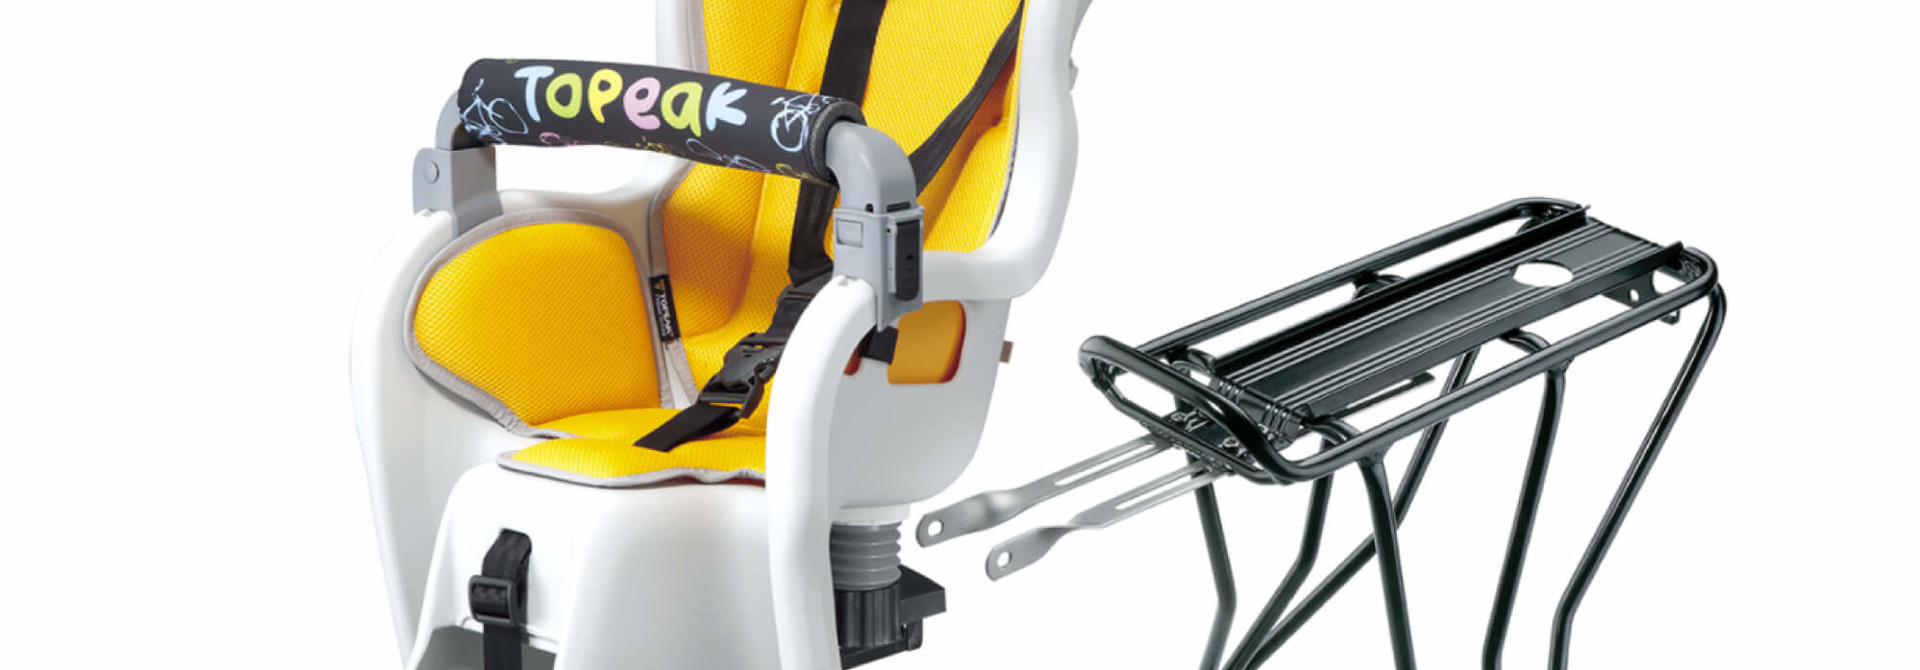 Baby Seat II Disc Brake (Old Tcs2202)